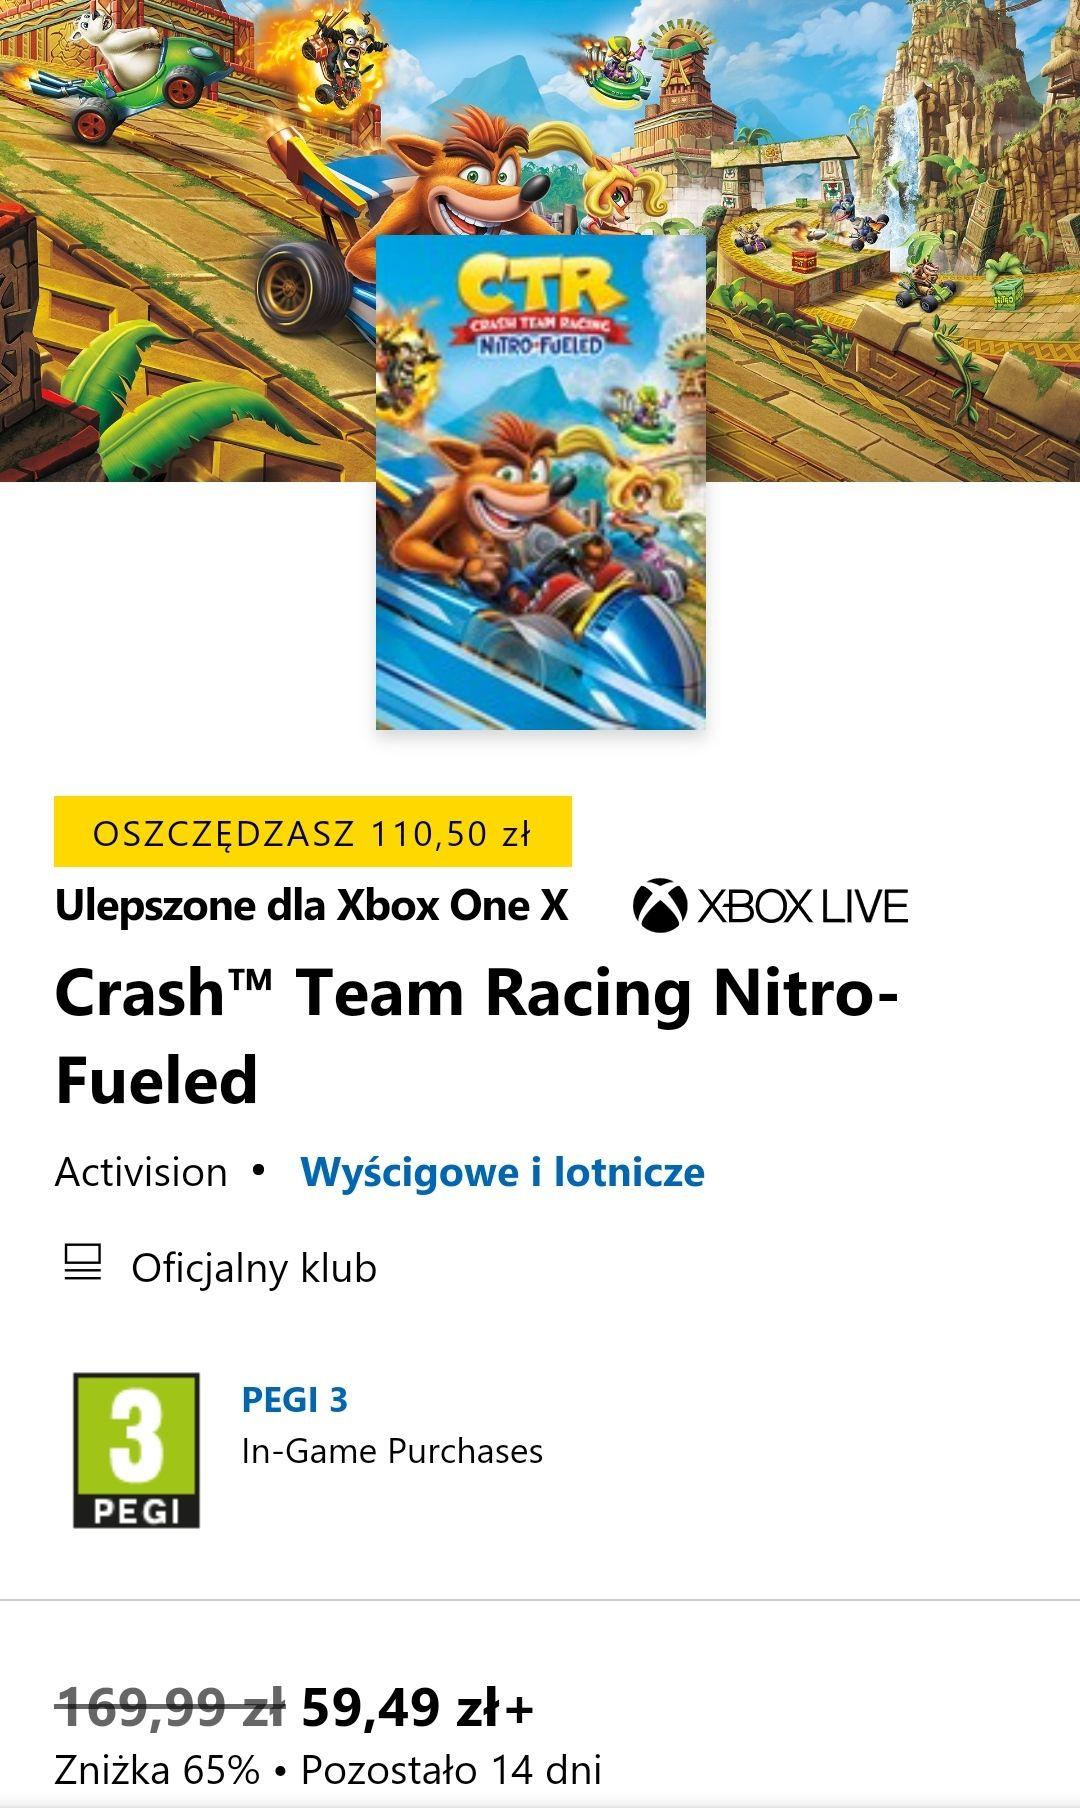 Crash™ Team Racing Nitro-Fueled Xbox